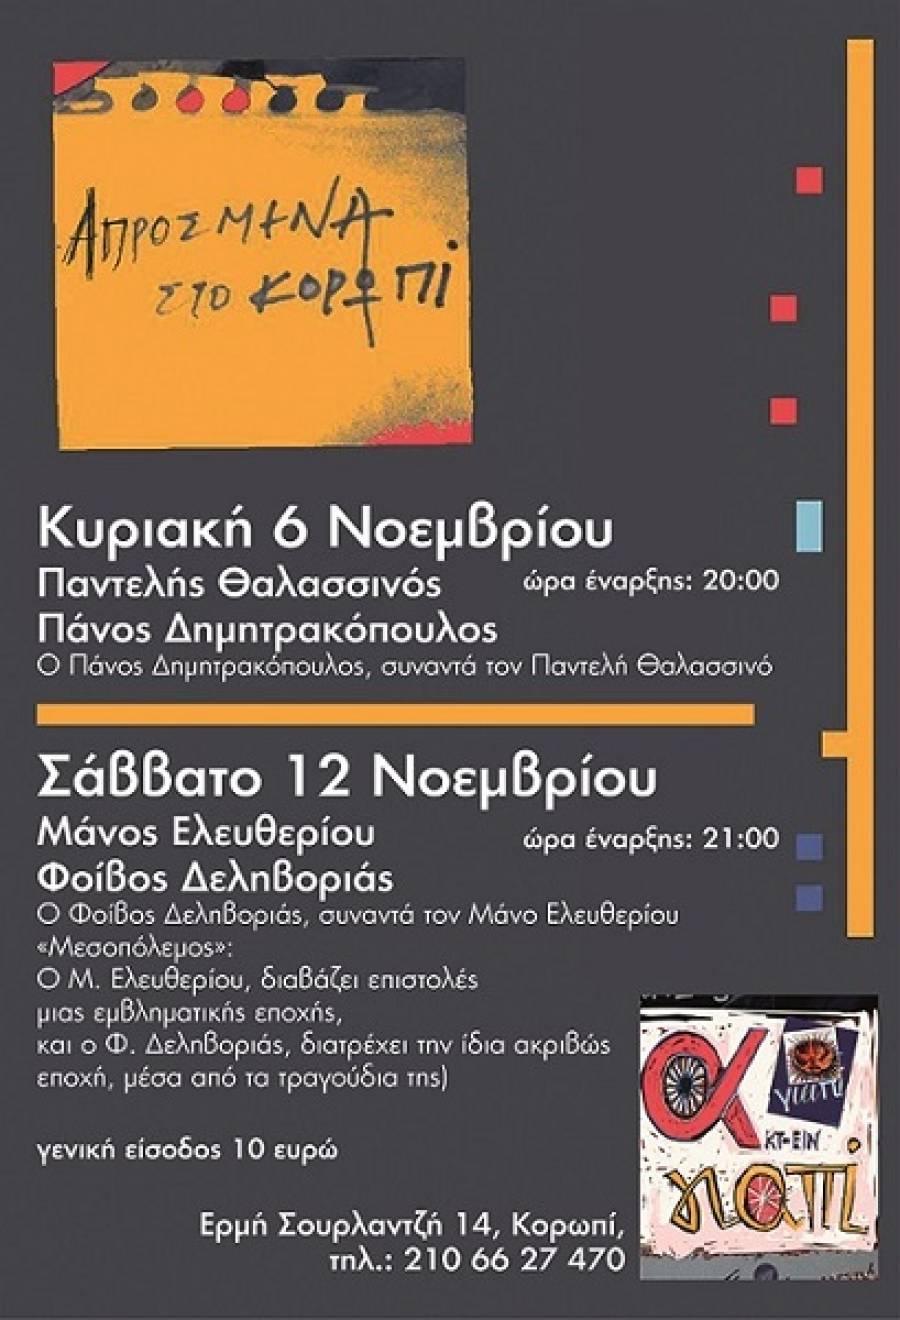 7e85fc9f3965 Μάνος Ελευθερίου- Φοίβος Δεληβοριάς -«Απρόσμενα»στο Κορωπί - ERT Open